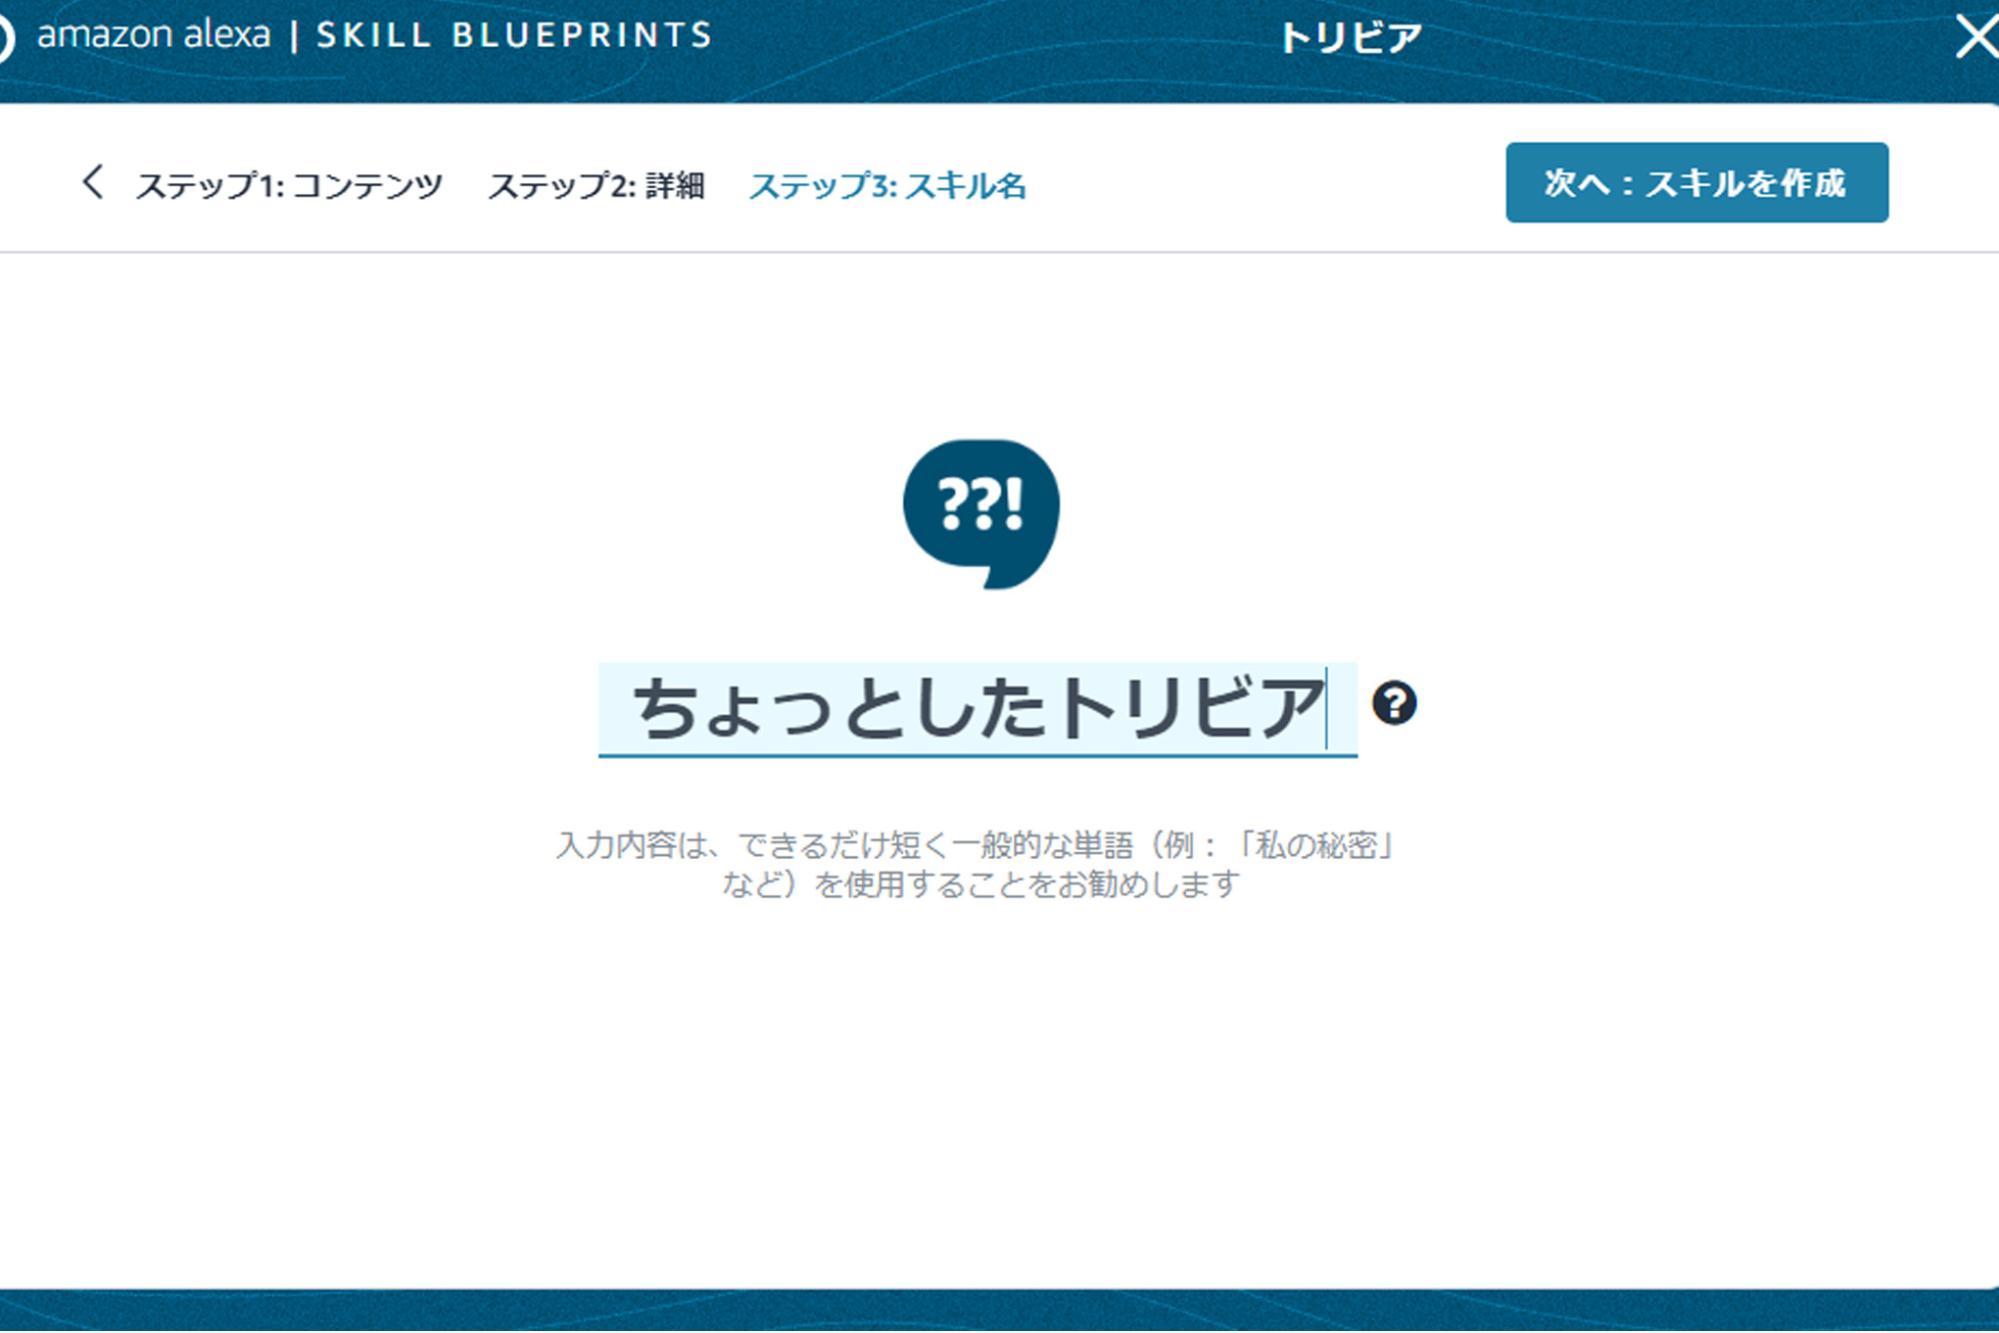 AlexaSkillBlueprints「操作画面」